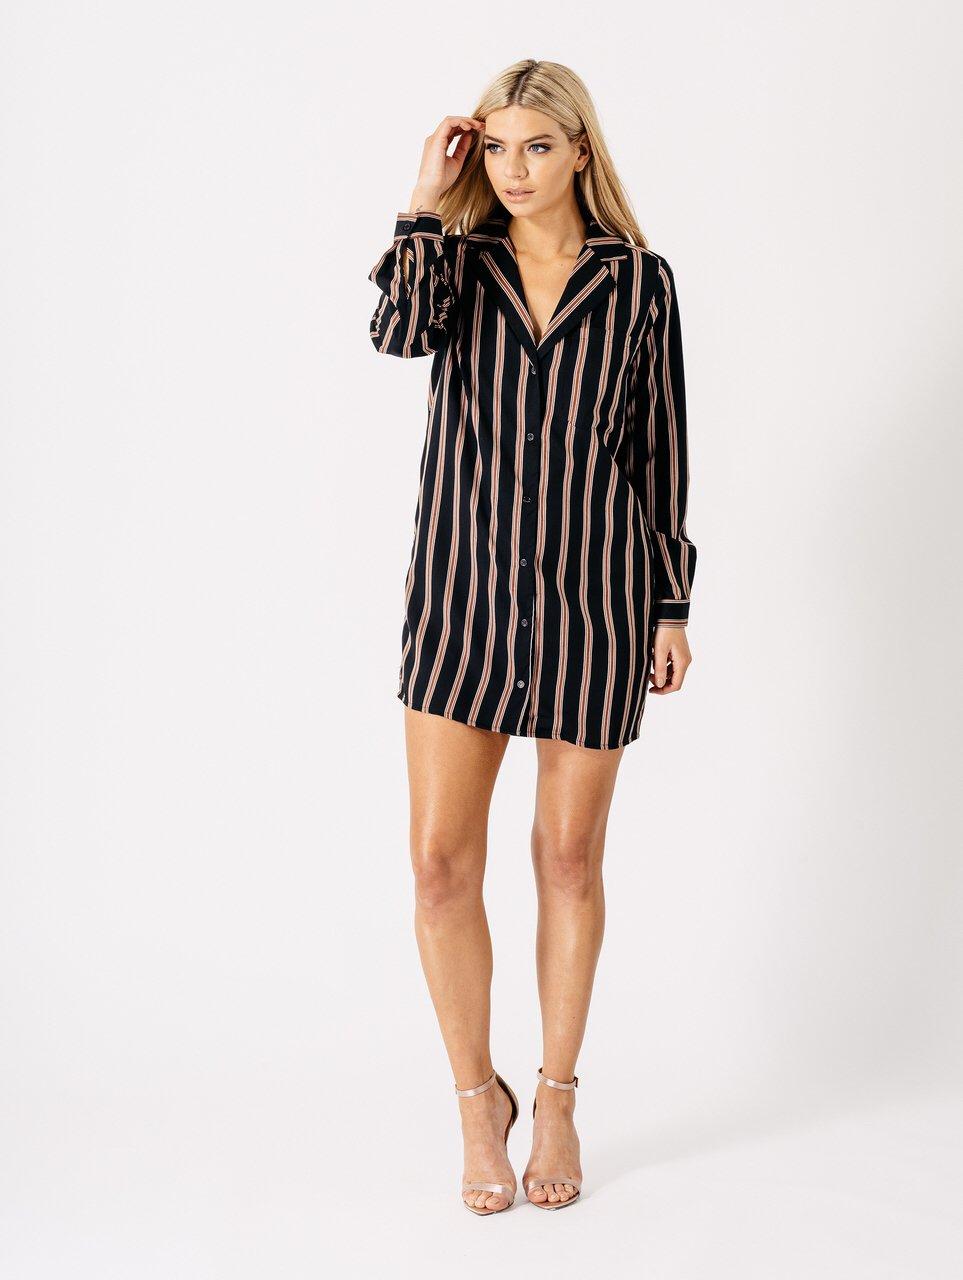 Image of Arie shirt dress